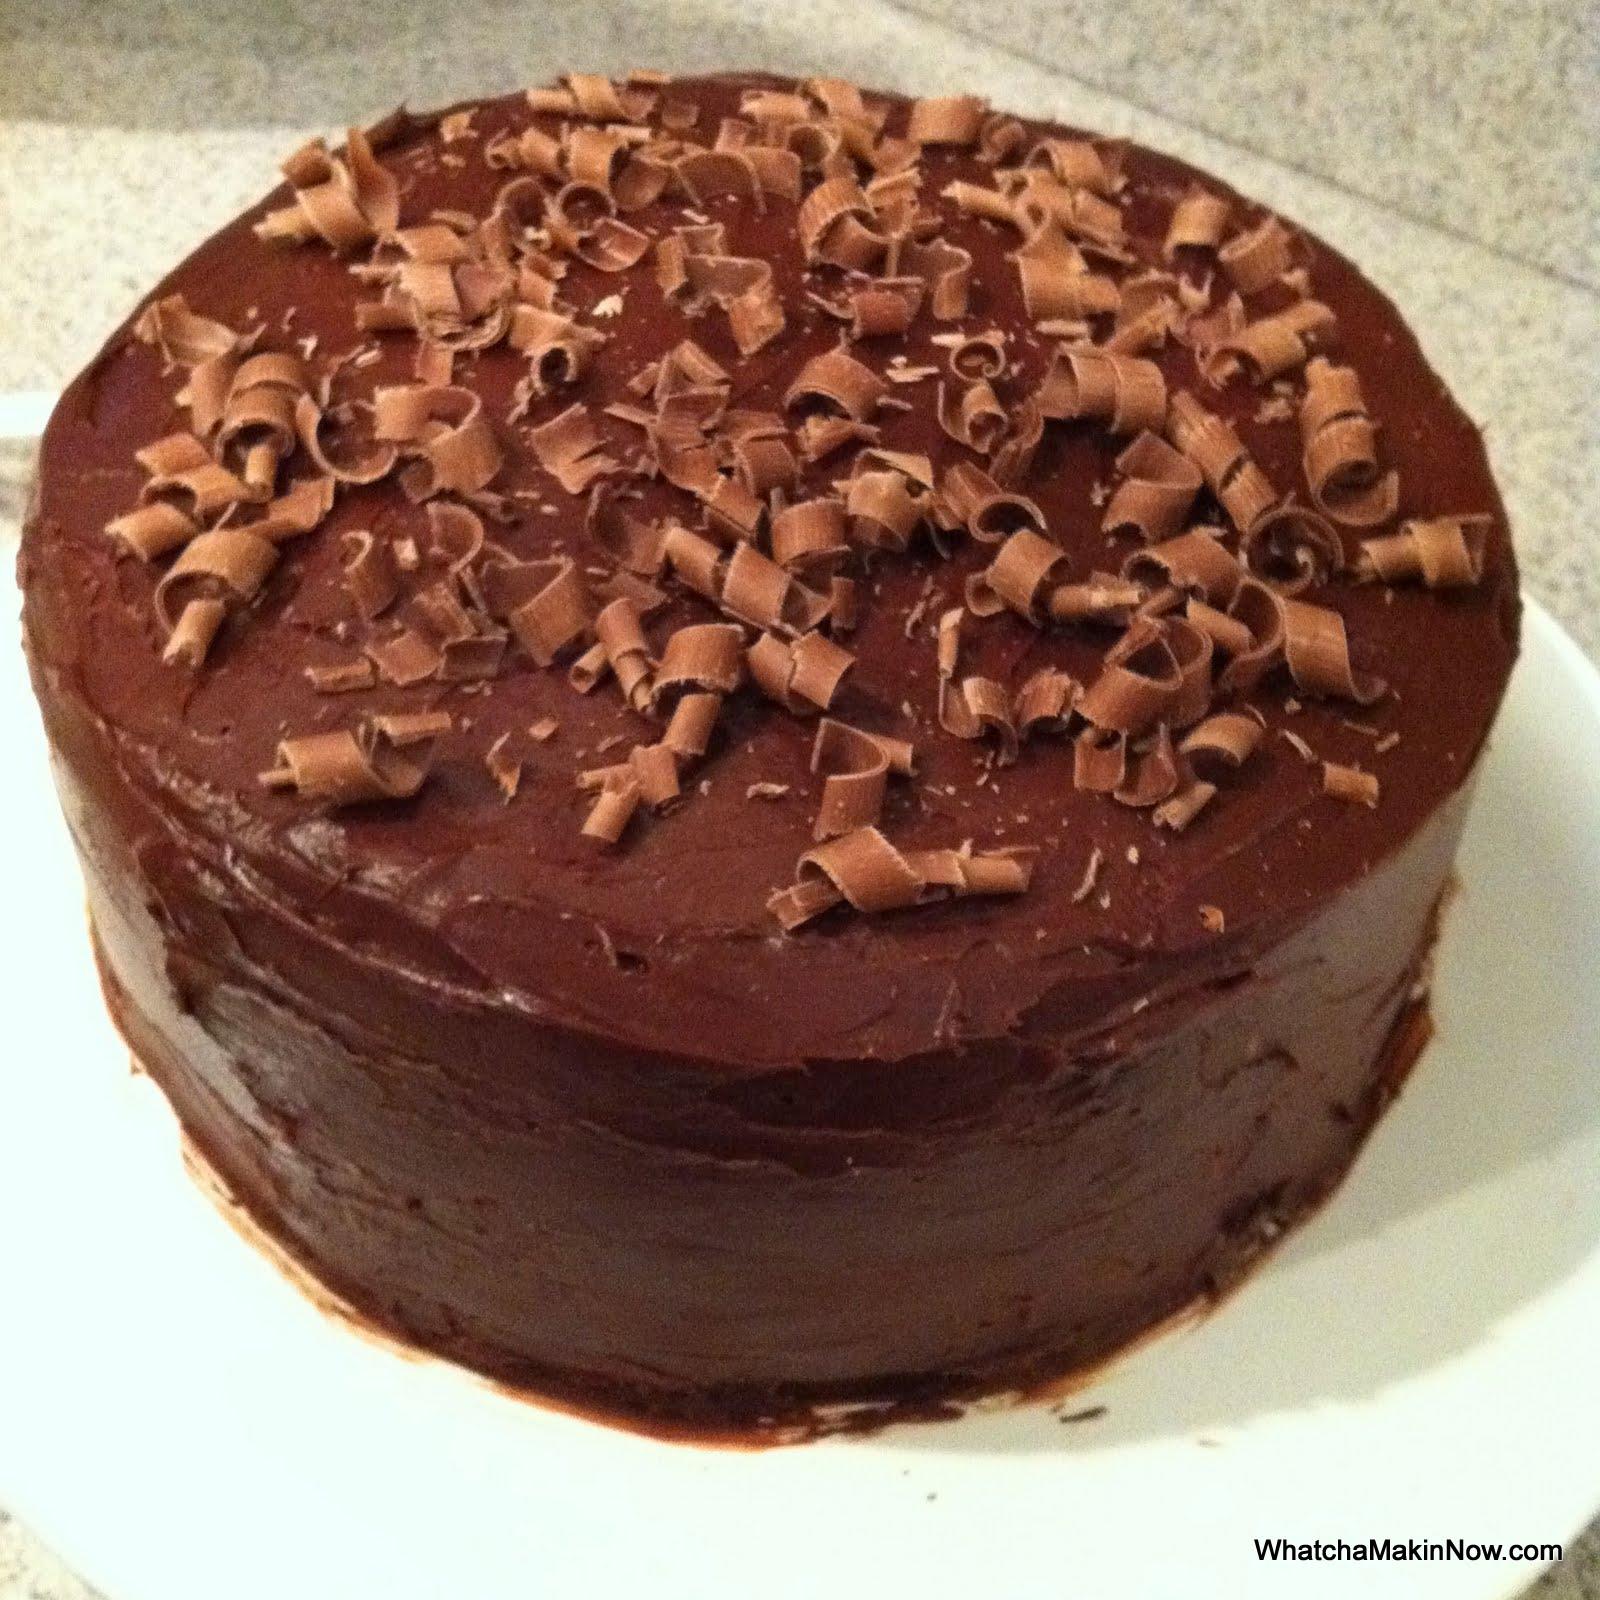 Whatcha Makin Now Chocolate Cheesecake Cake from Recipe Girl